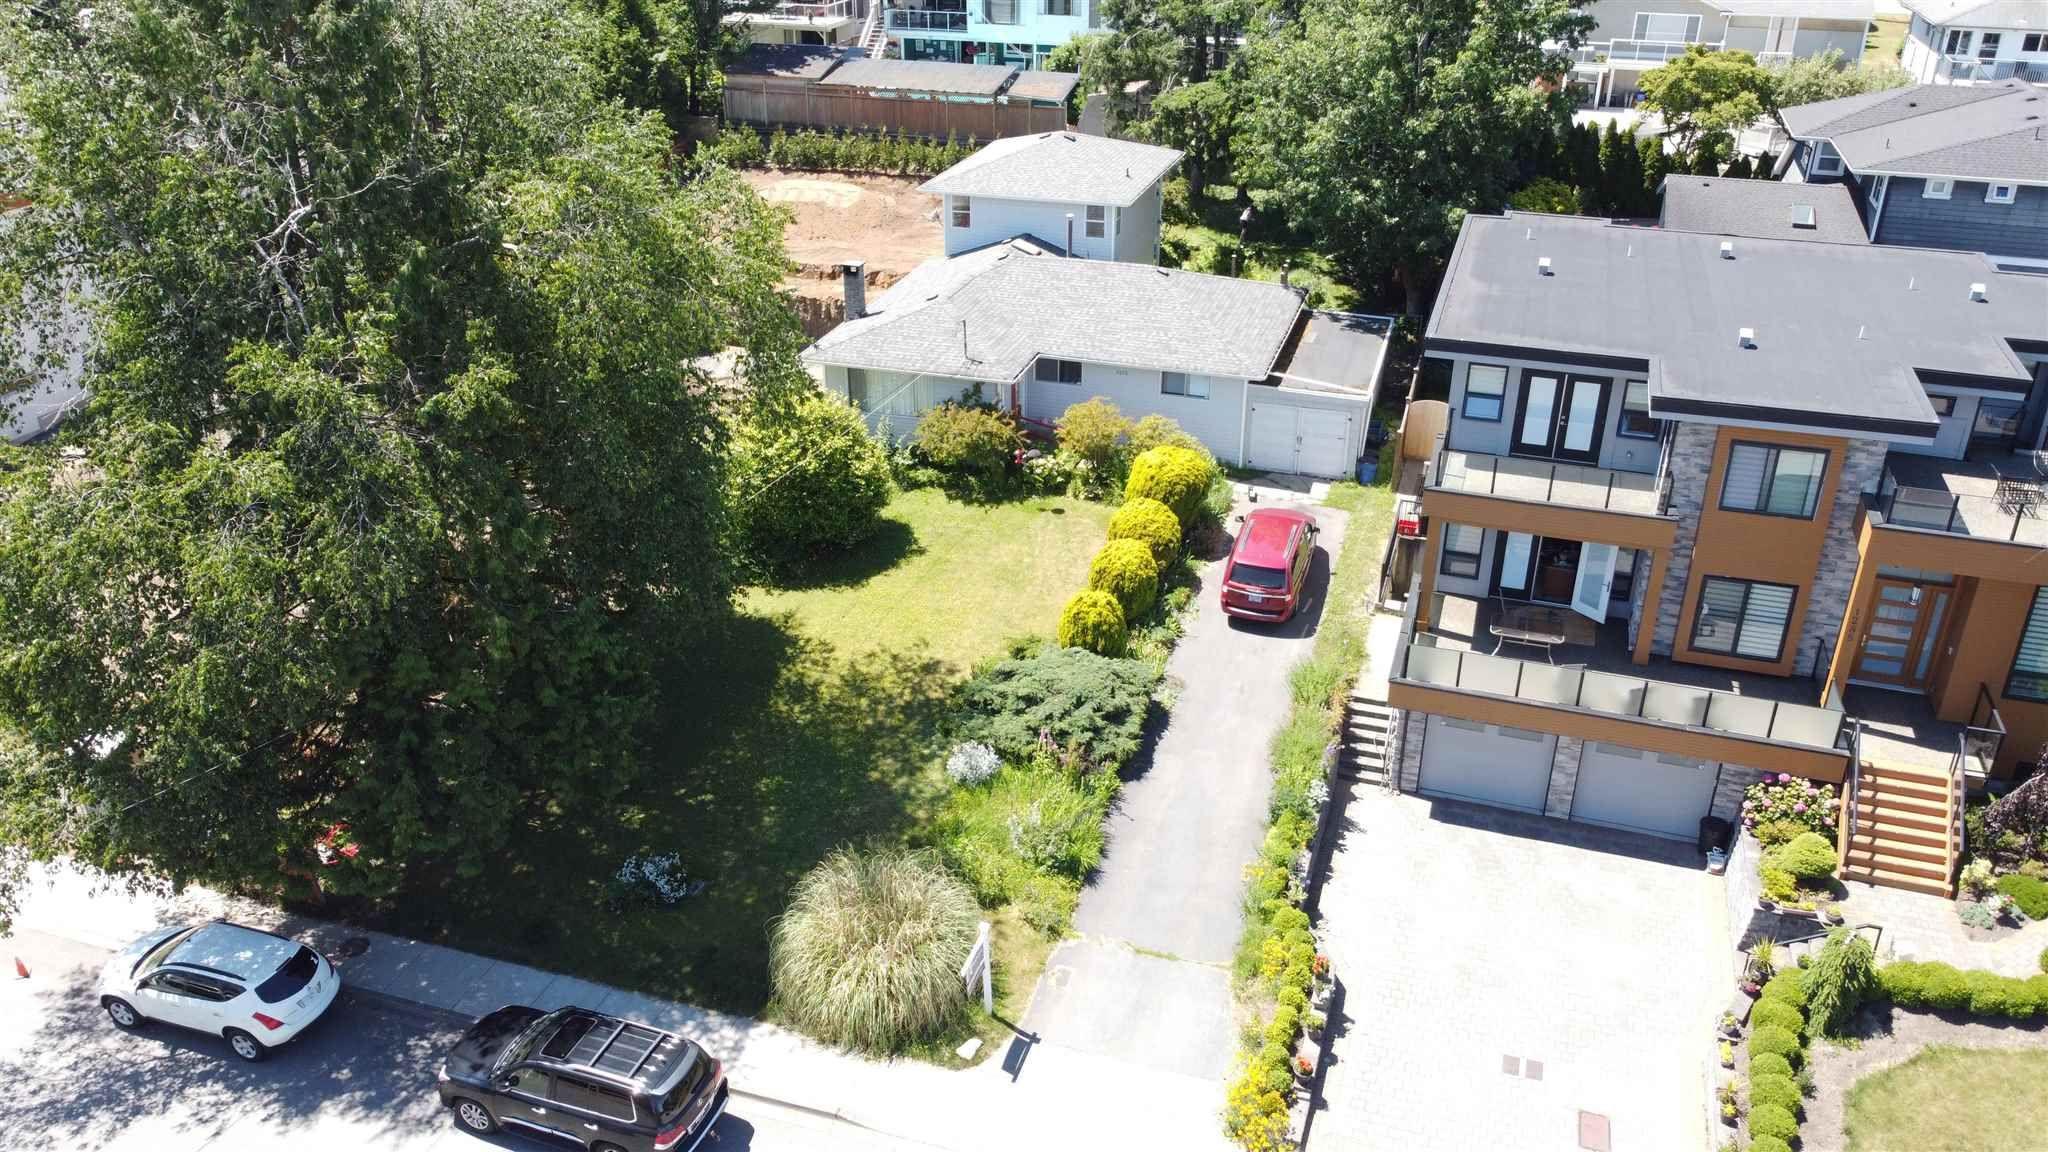 Main Photo: 1275 KENT Street: White Rock House for sale (South Surrey White Rock)  : MLS®# R2575494